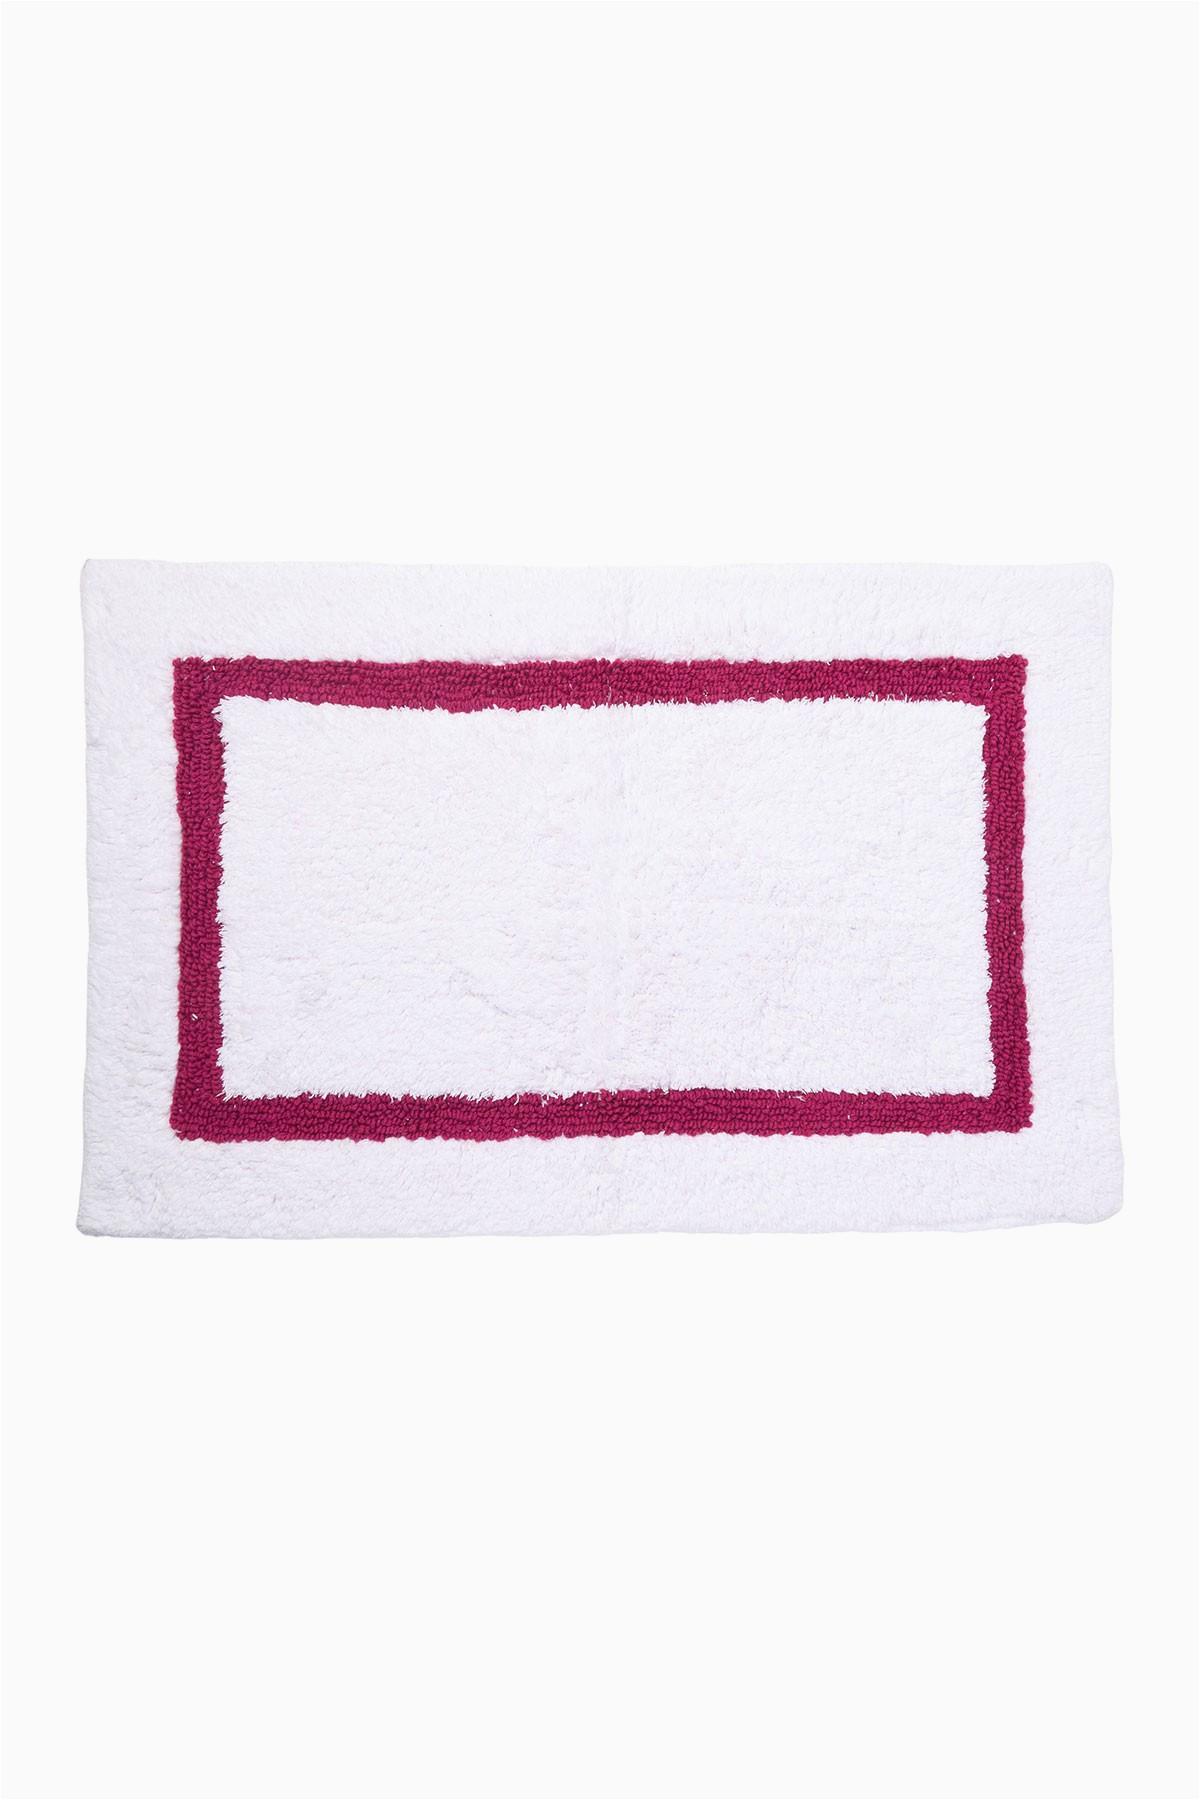 kate spade new york white pink dahlias bath rug 21 x 31